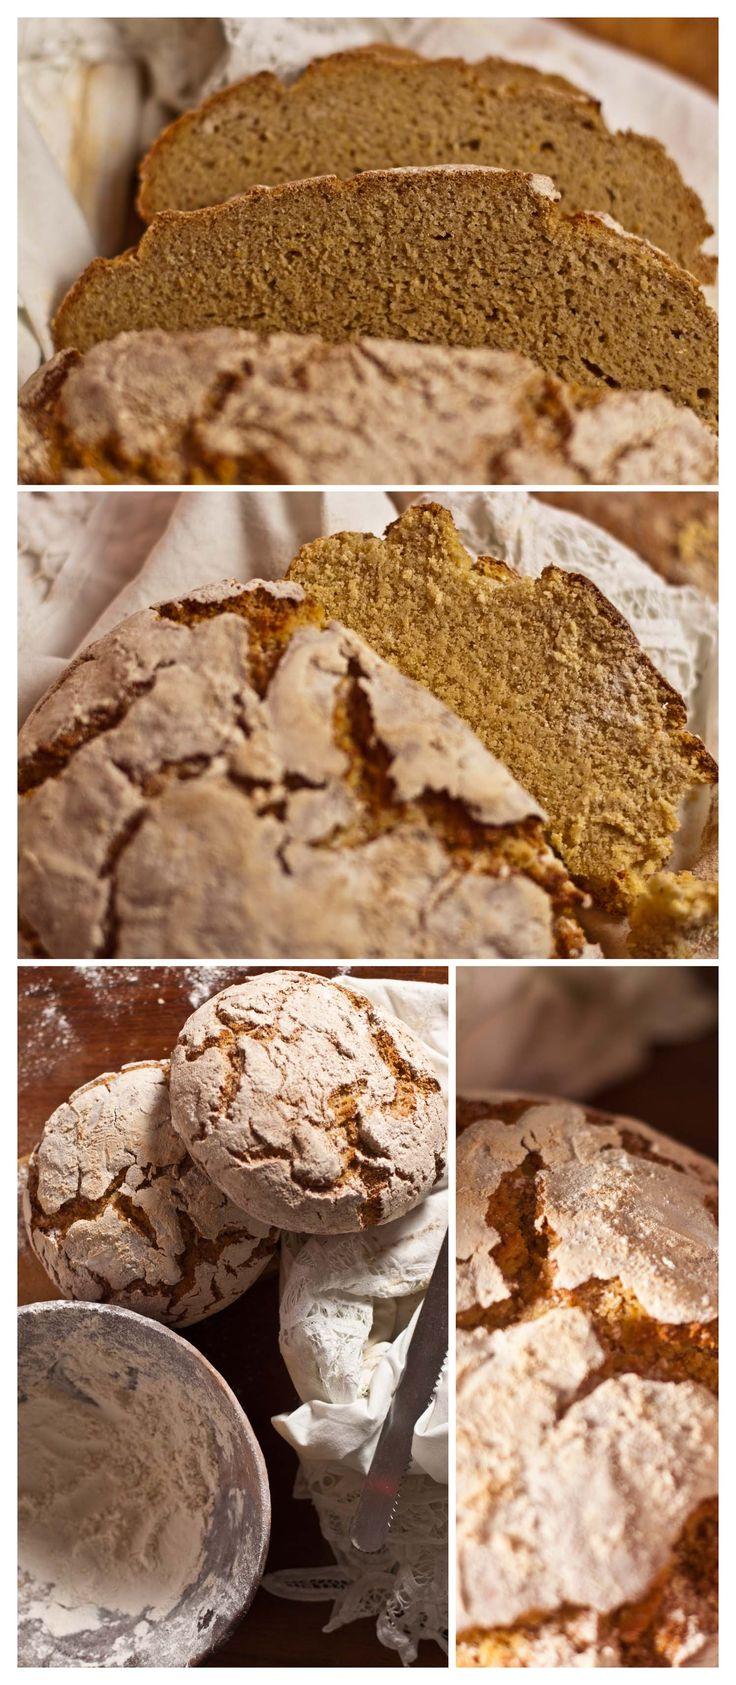 BROA DE MILHO: pan de maíz portugués